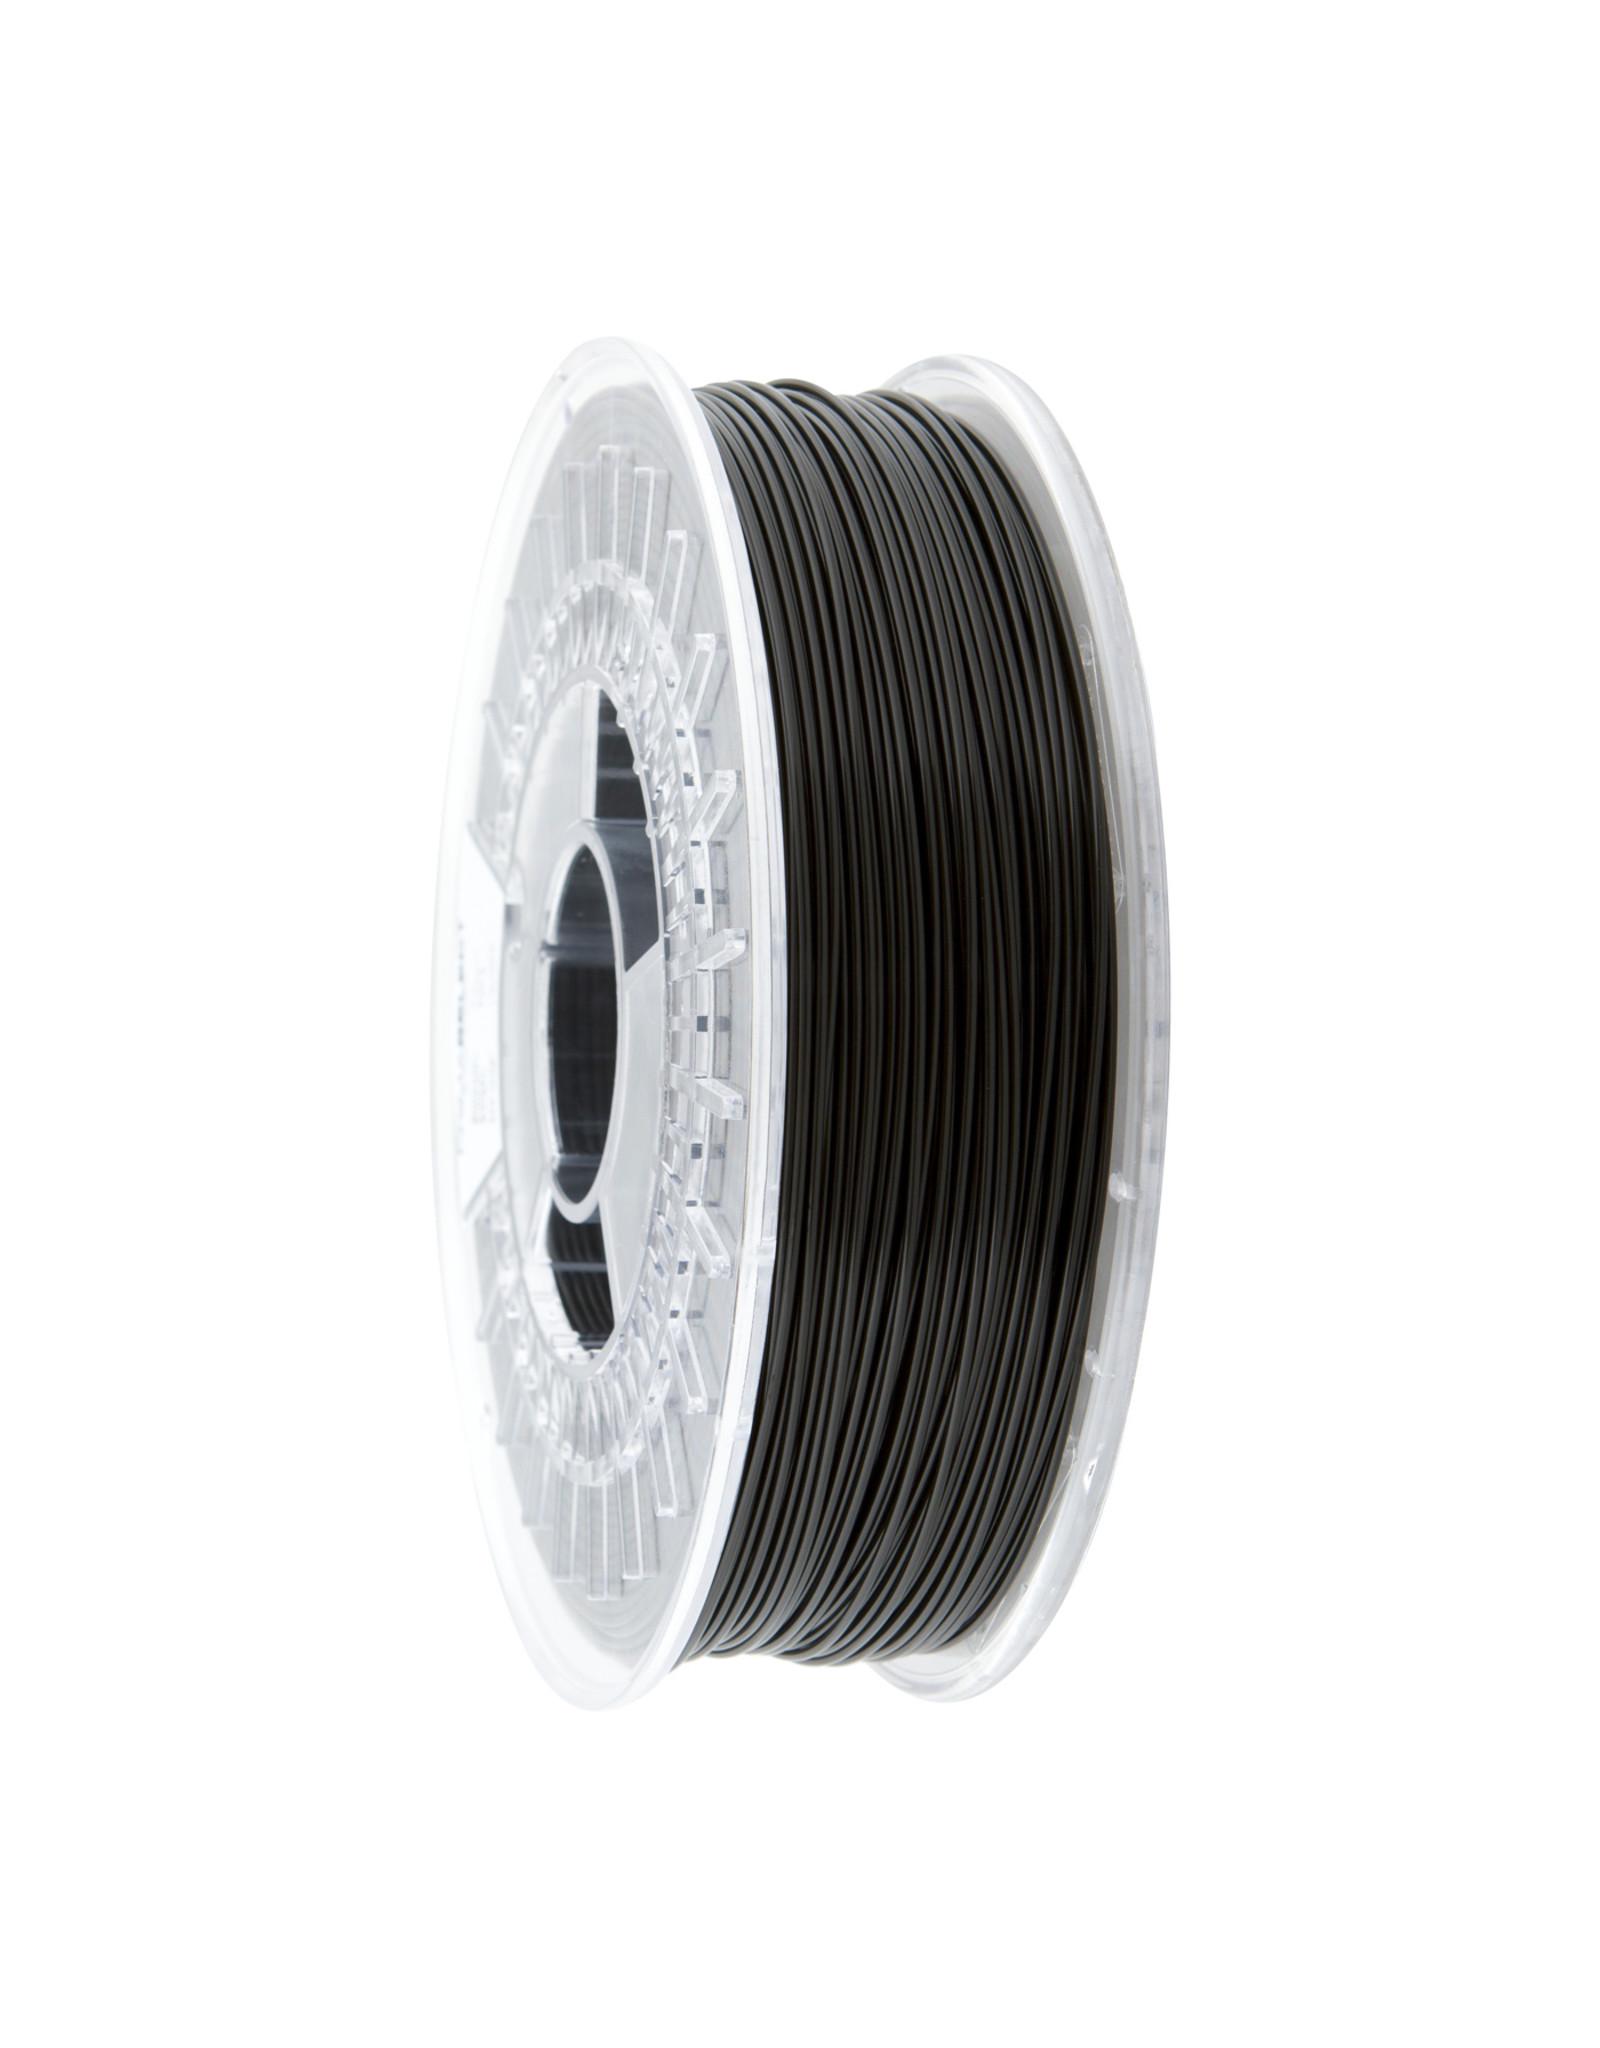 Prima PrimaSelect PLA 1.75mm - 750gr Noir